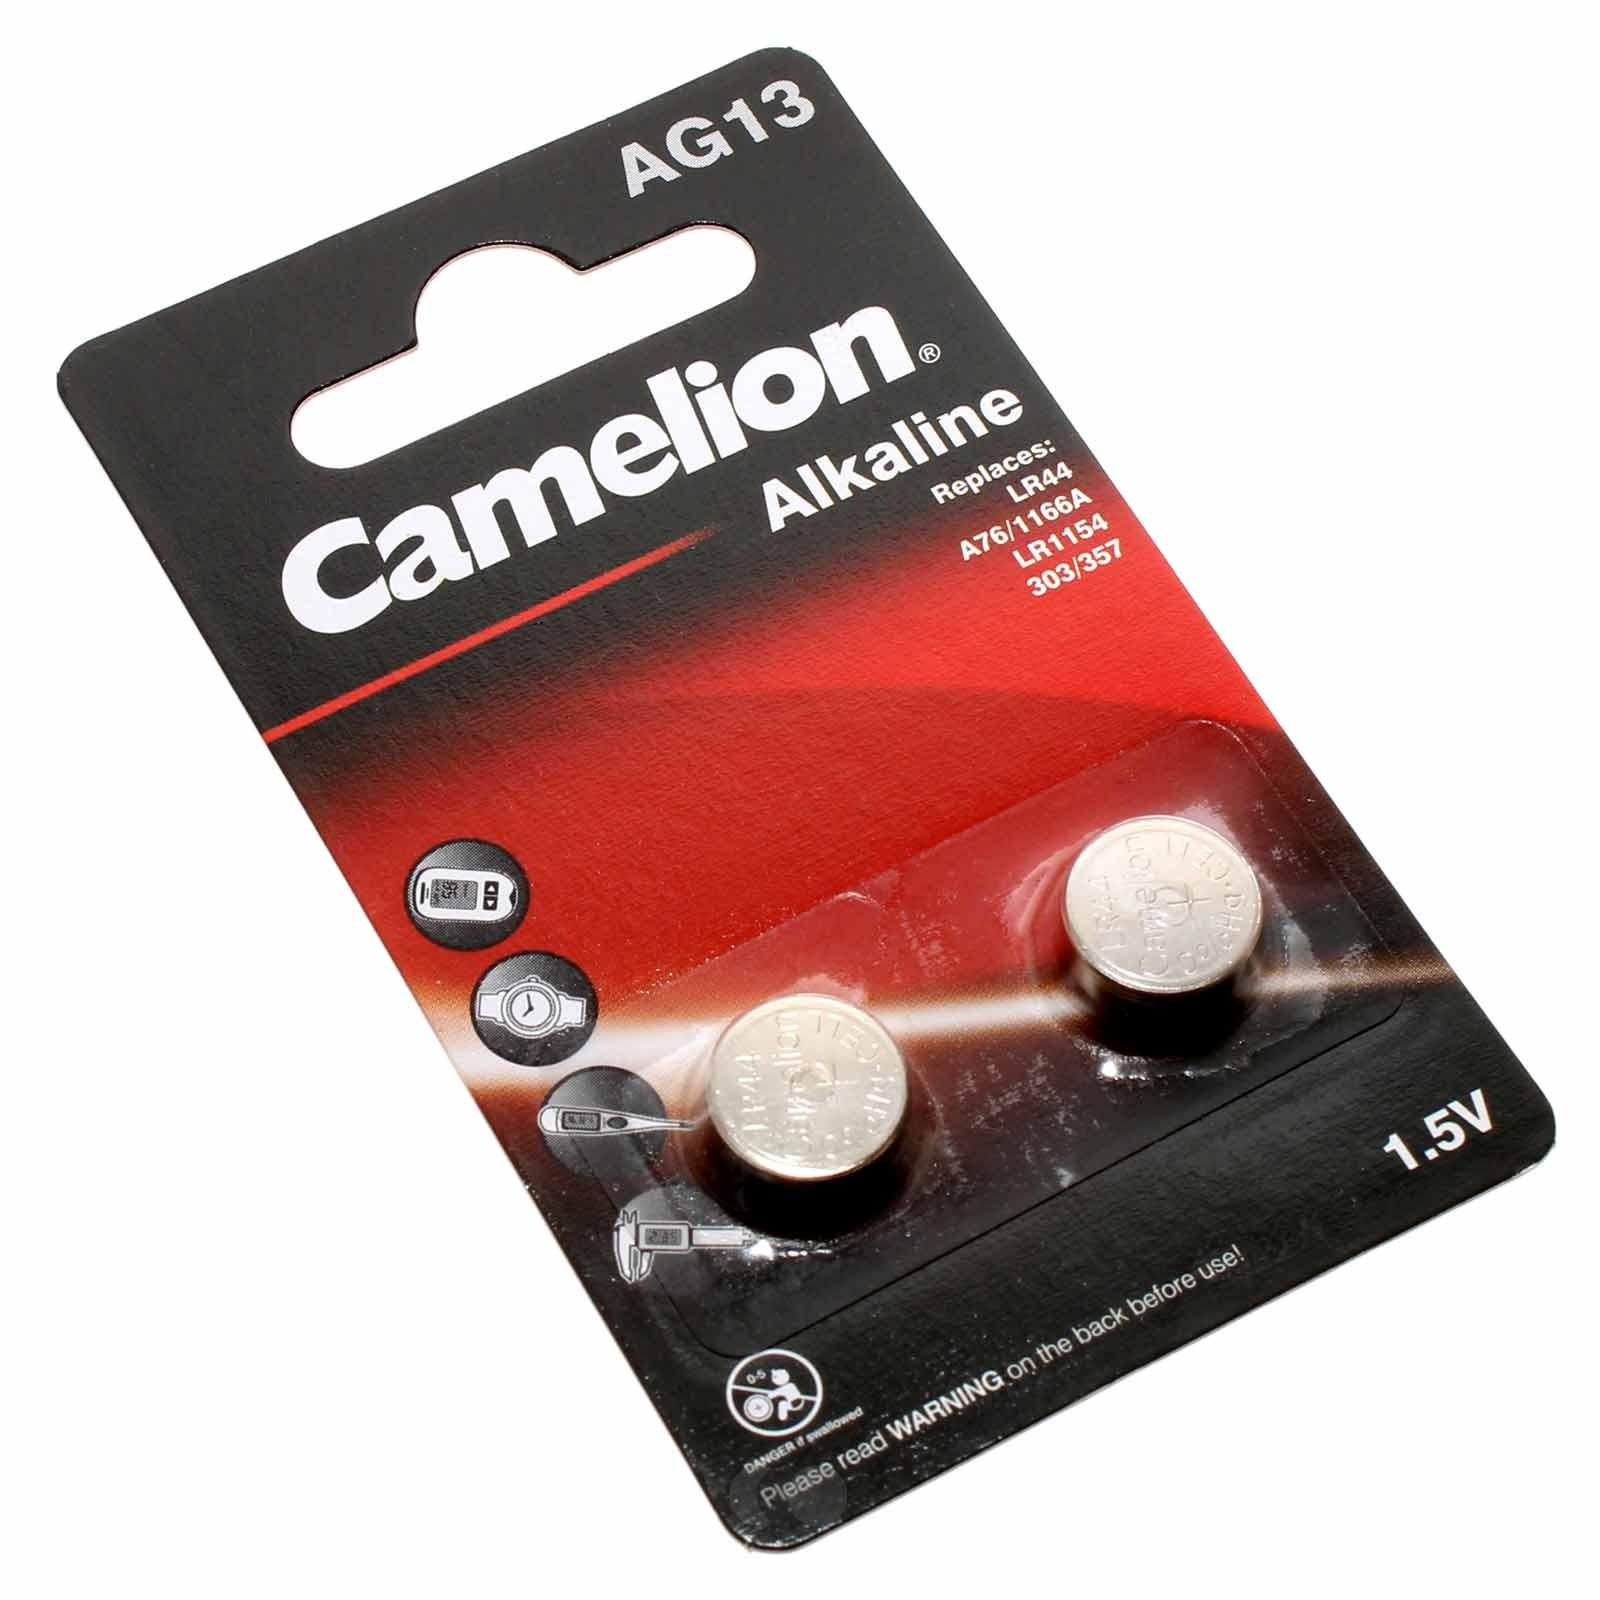 2er Pack Camelion AG13 Alkaline Knopfzelle Batterie 1,5V ,138mAh, AG13-BP2 (0%Hg), Fernbedienung, Spielzeug